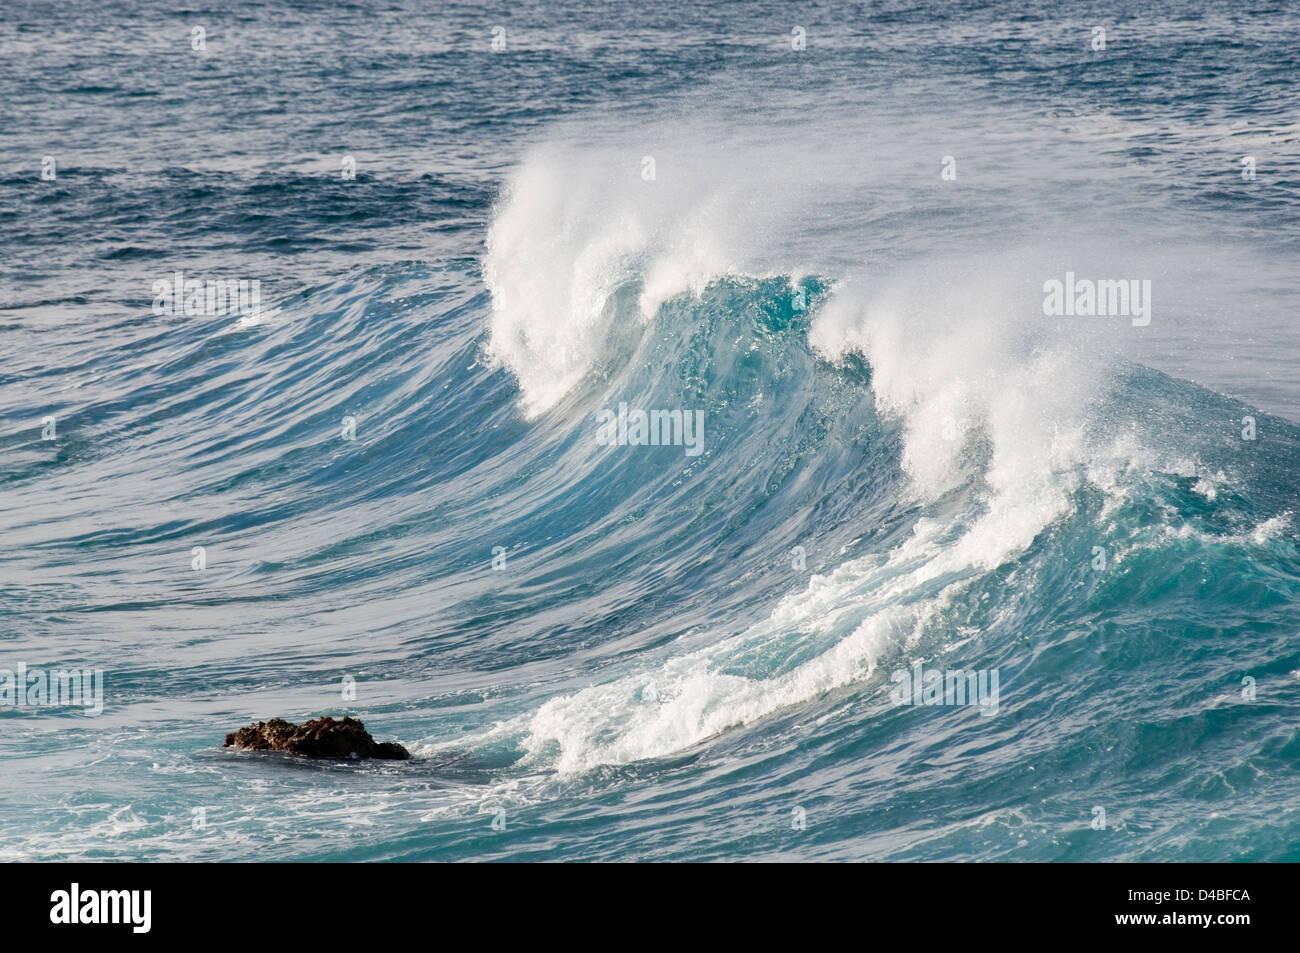 wave waves breaking breakers sea seas rough water motion energy white horses spray - Stock Image